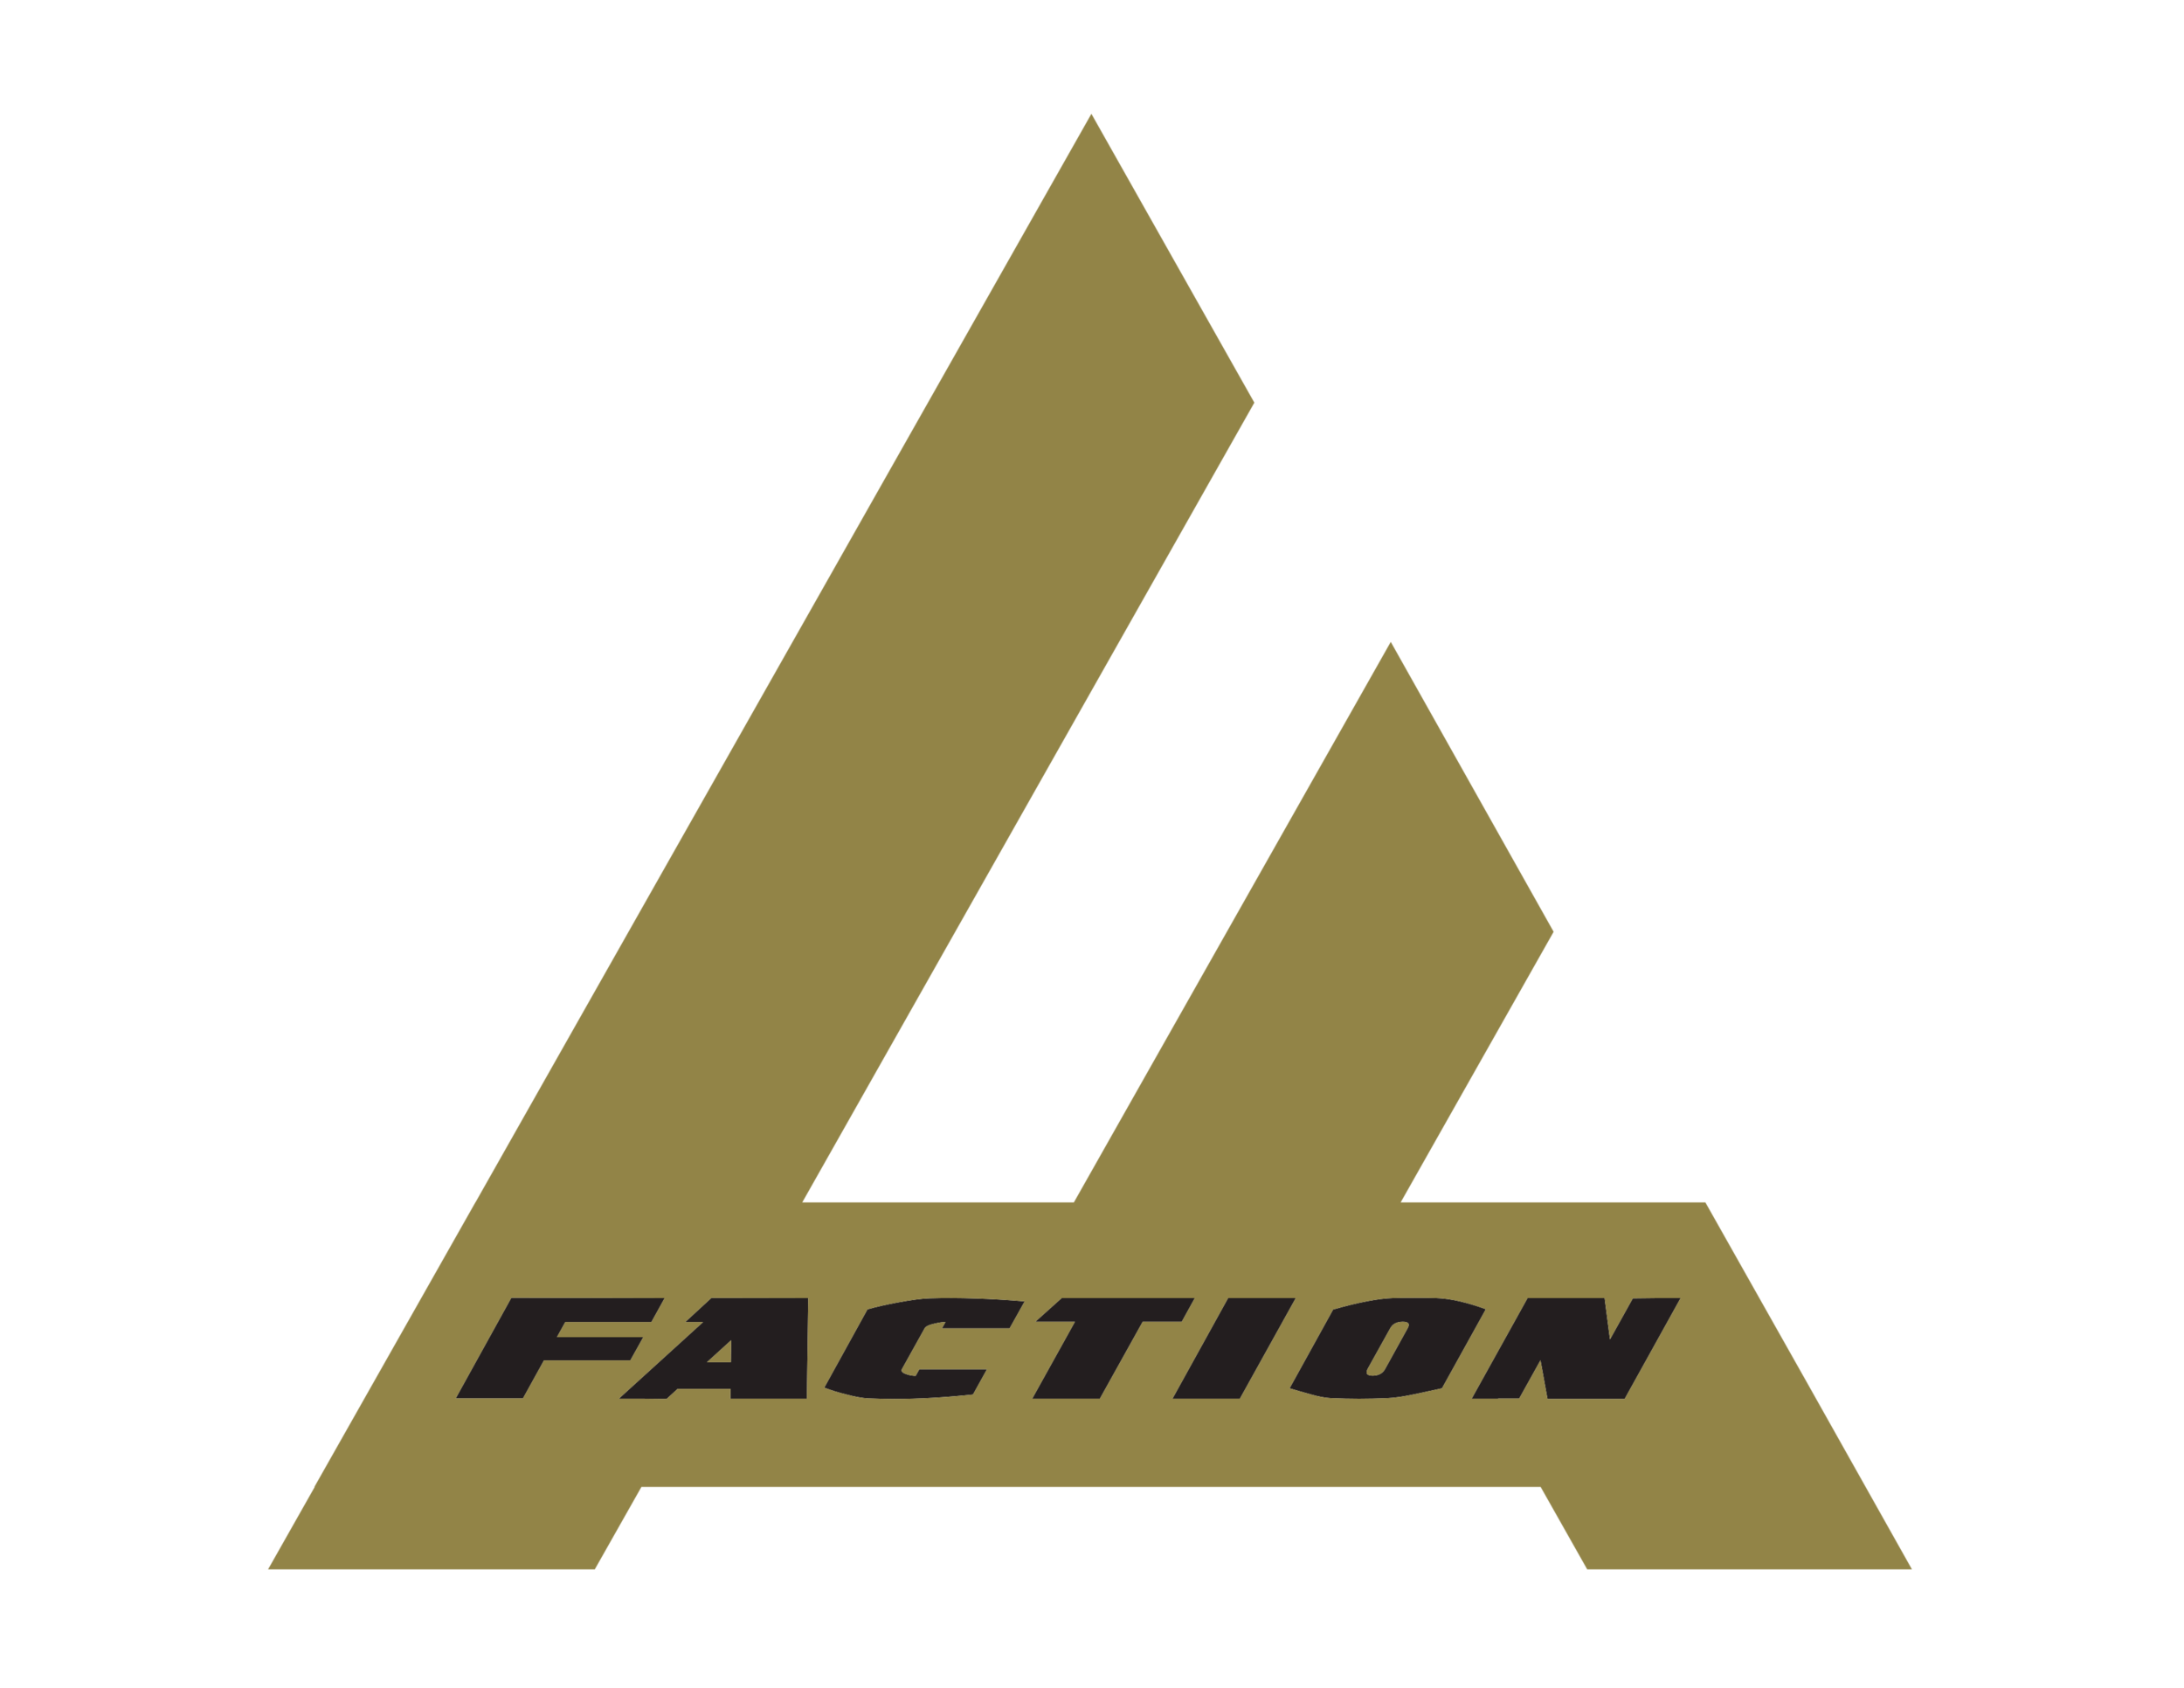 FactionLogo_Gold-Black.png